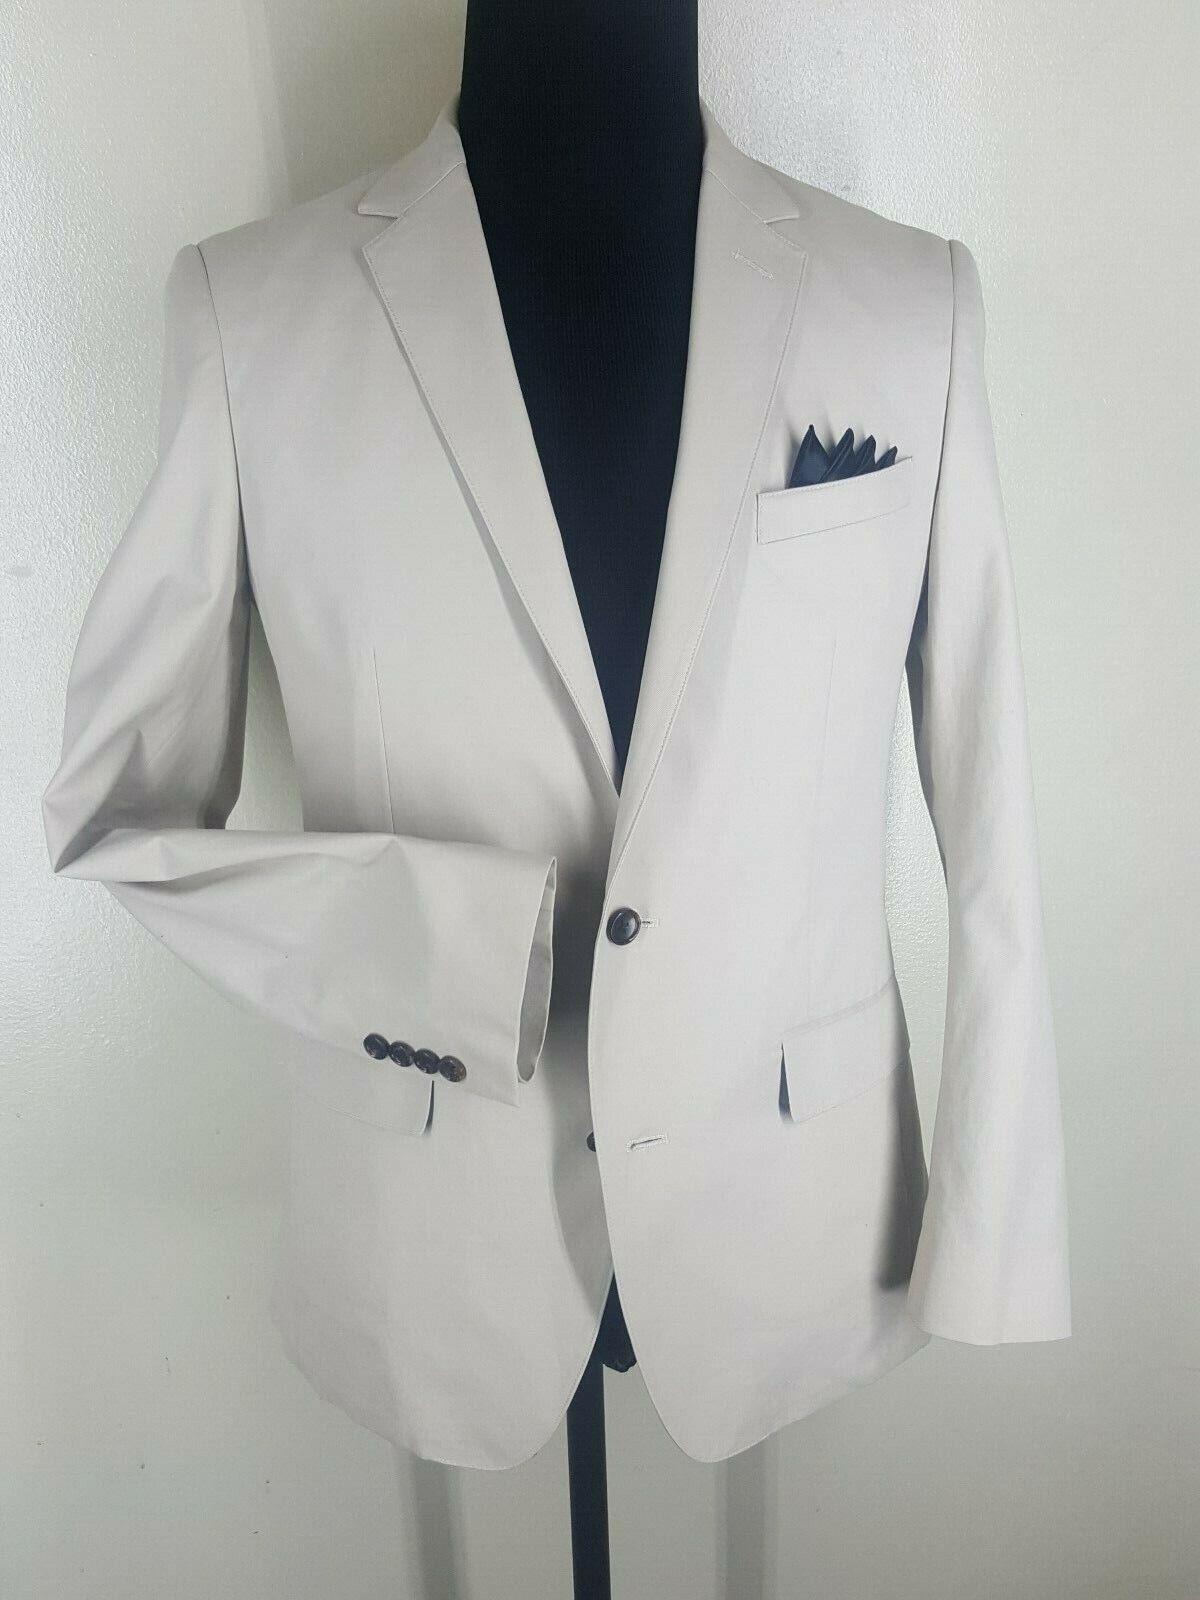 BONOBOS Recent 100% Cotton Beige Blazer 2 Btn Side Vents US Size 38 Reg.